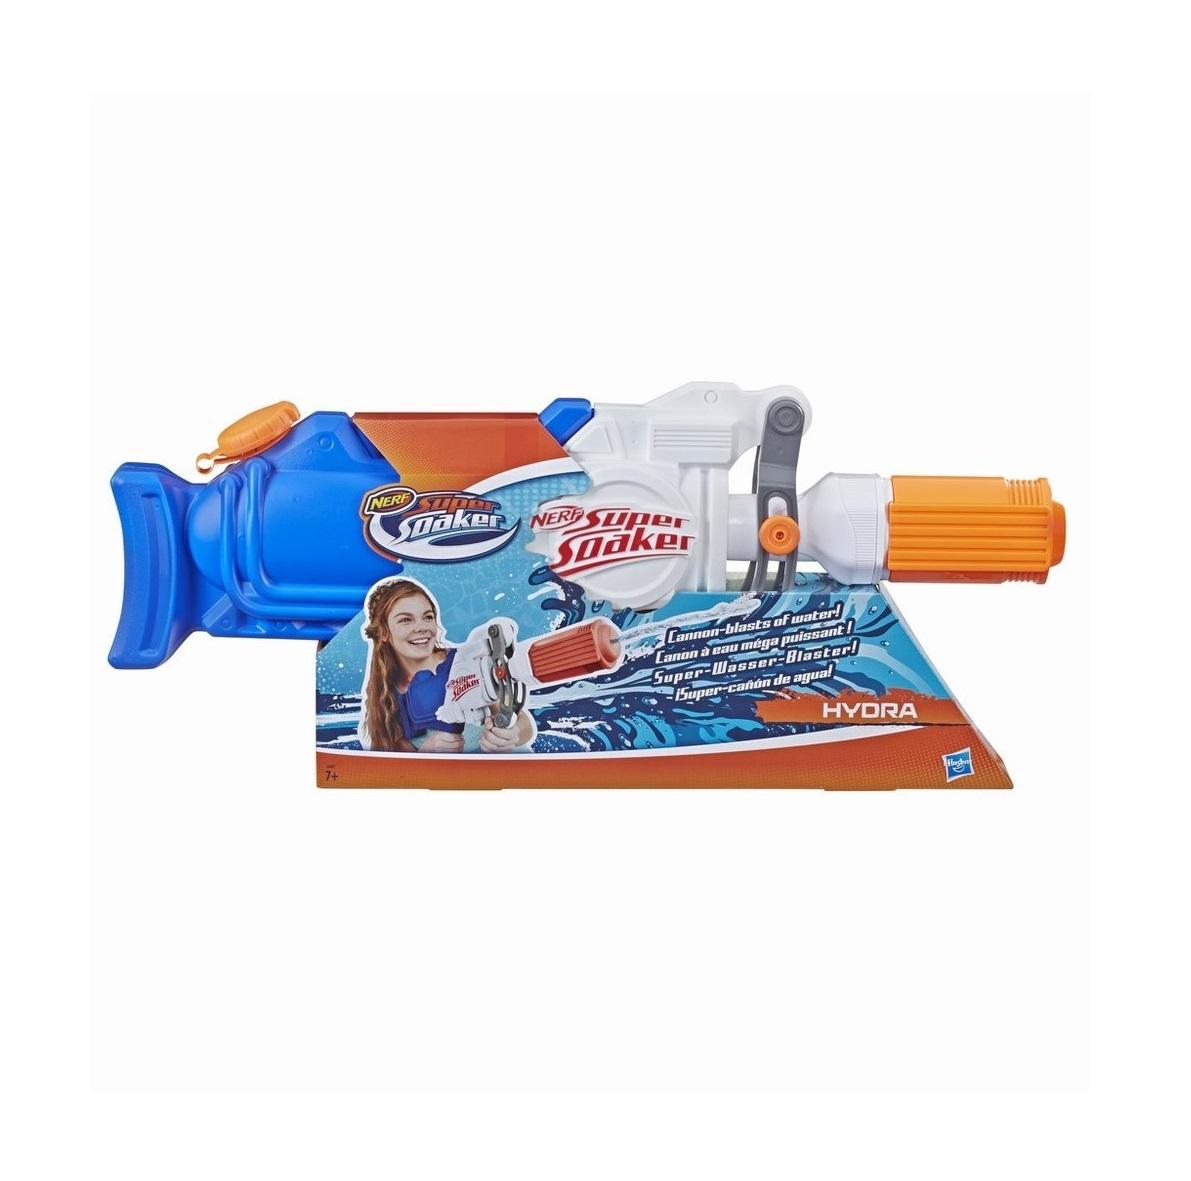 Blaster cu apa Hasbro Nerf Super Soaker Hydra imagine hippoland.ro